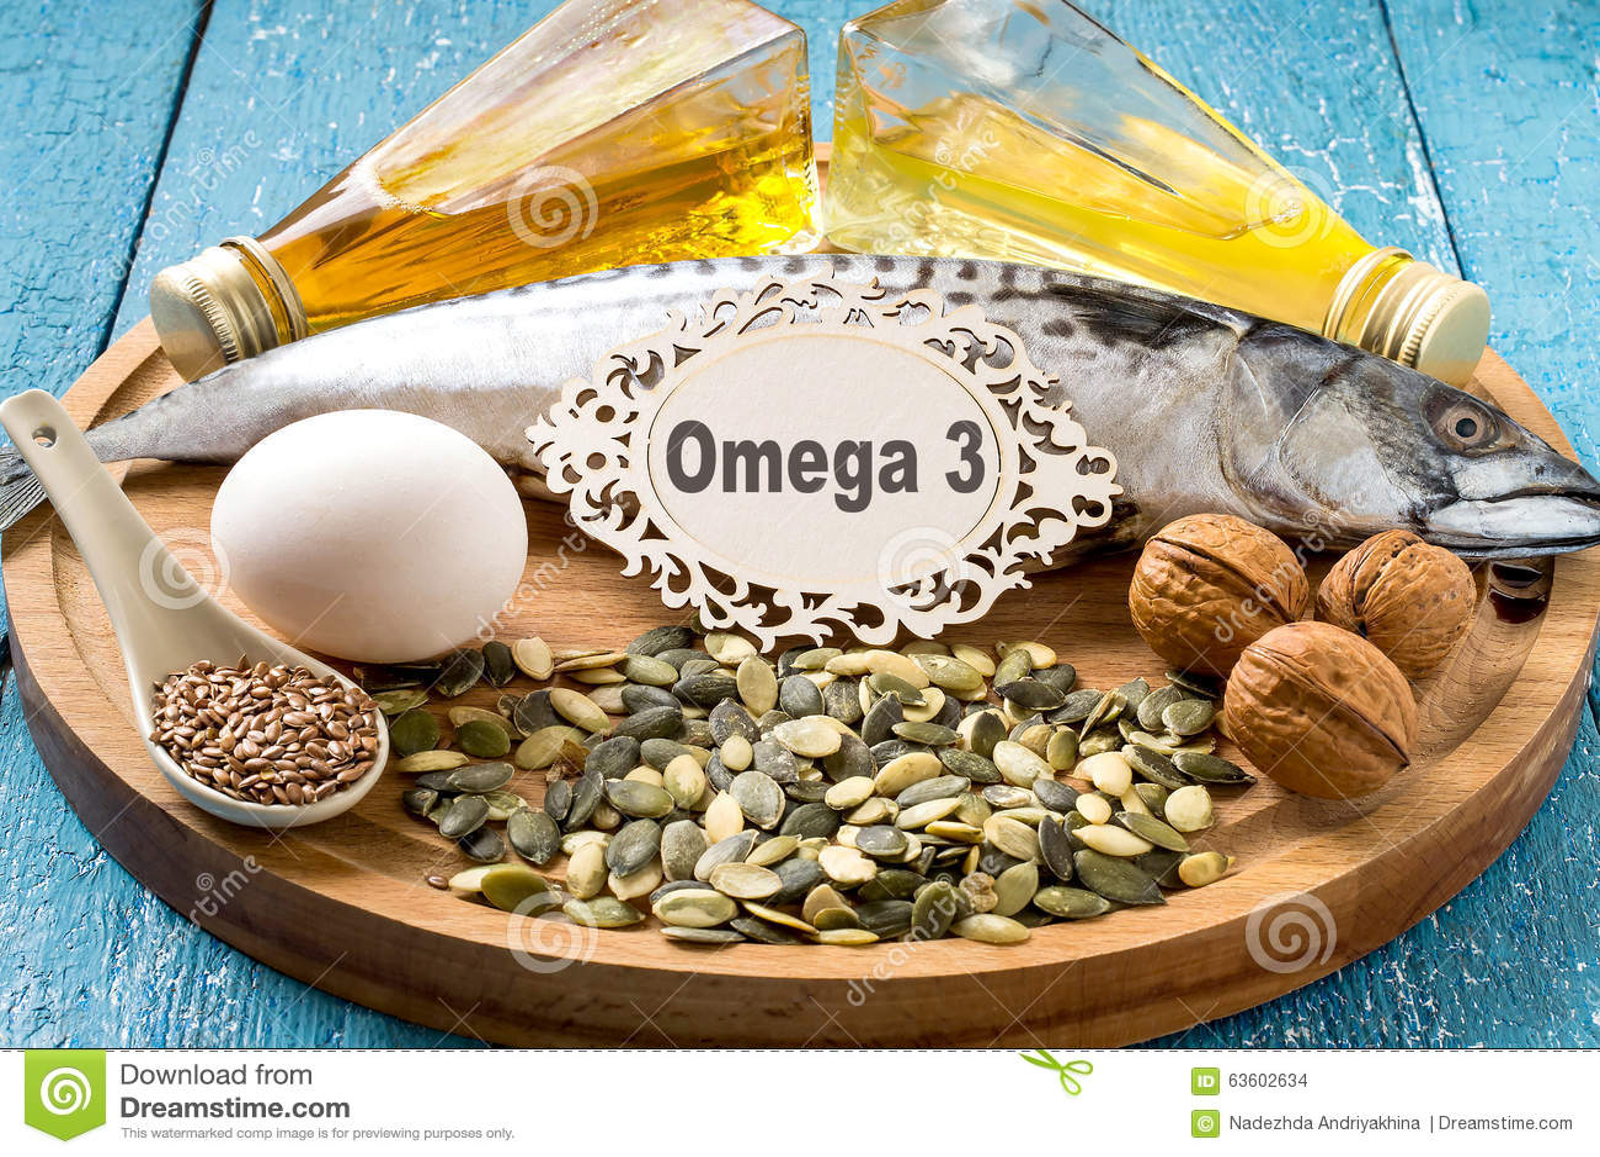 Znalezione obrazy dla zapytania obrazy do omega